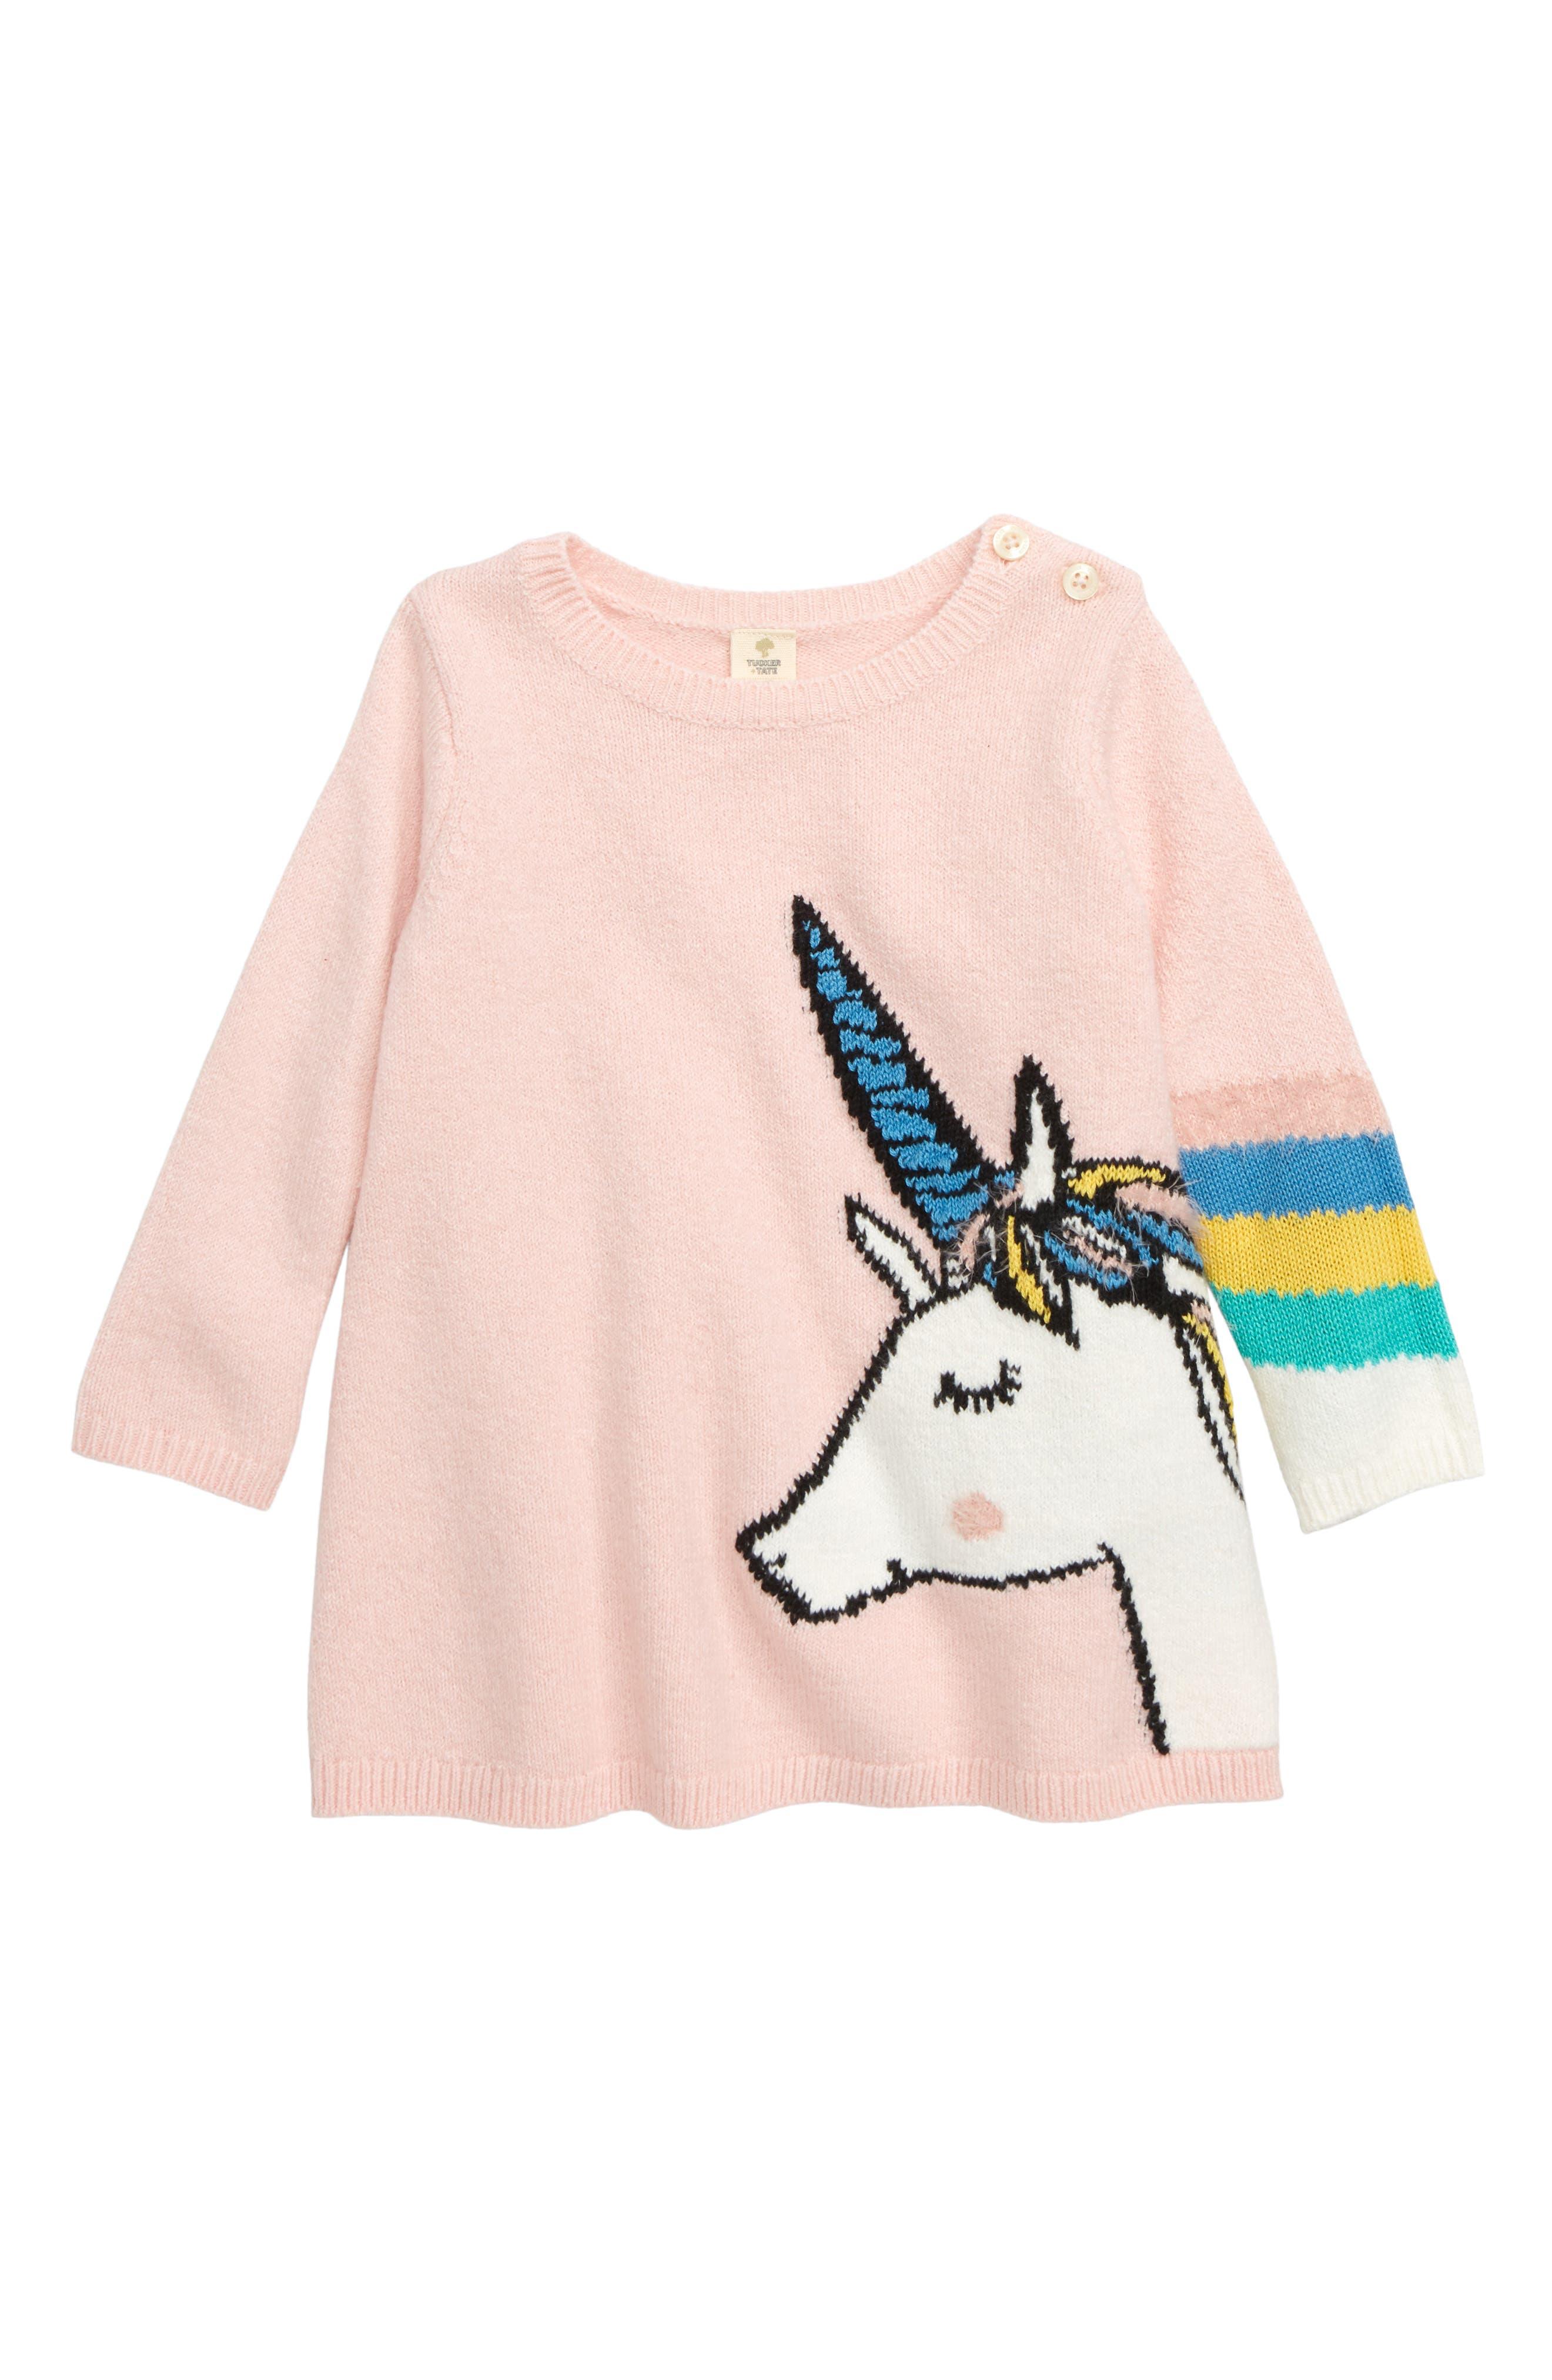 TUCKER + TATE Unicorn Sweater Dress, Main, color, 680